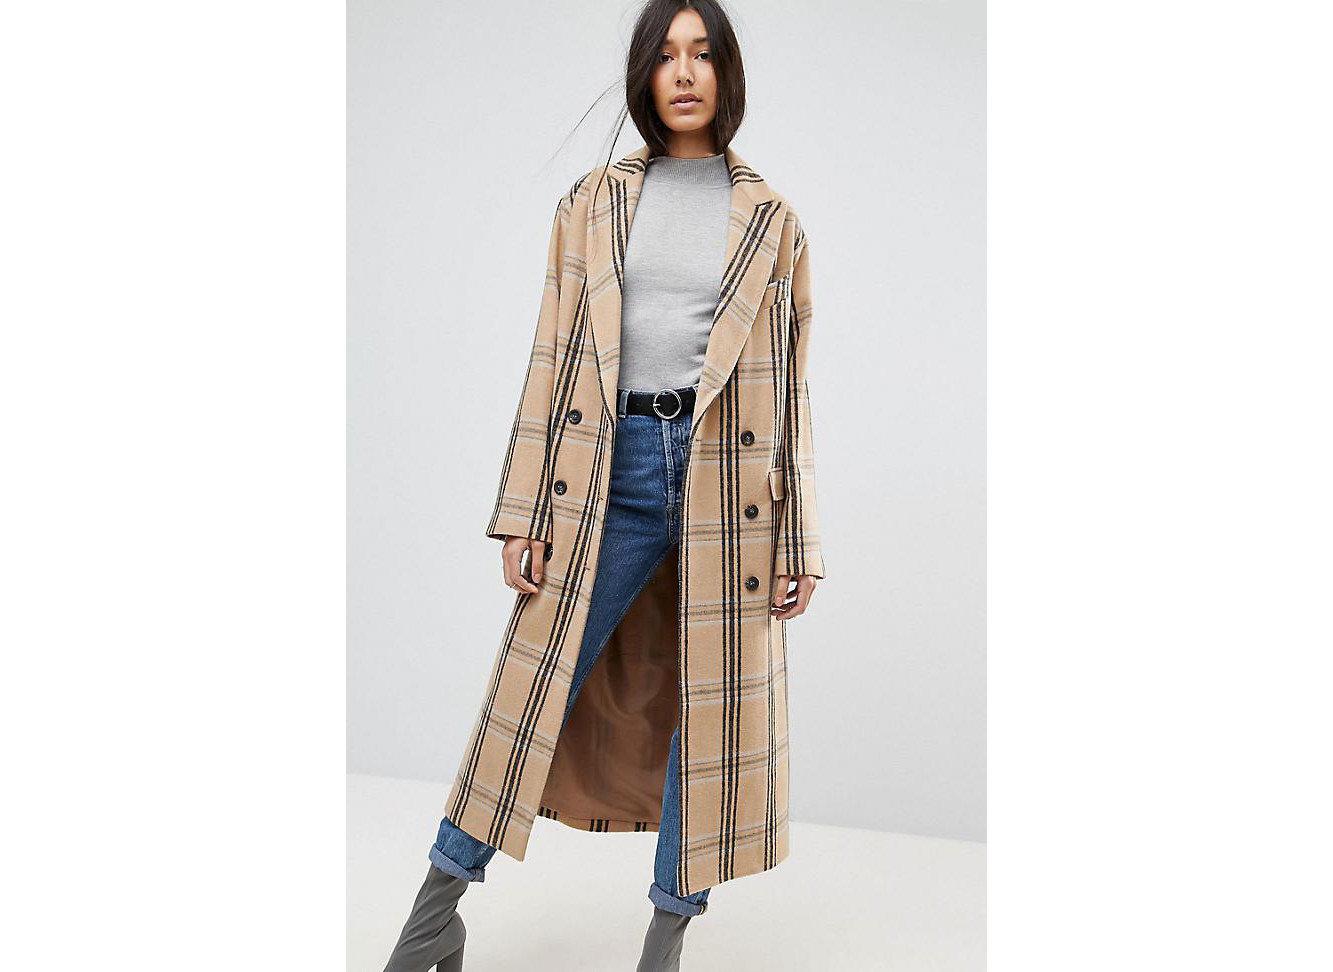 Style + Design Travel Shop fashion model coat outerwear costume fashion design